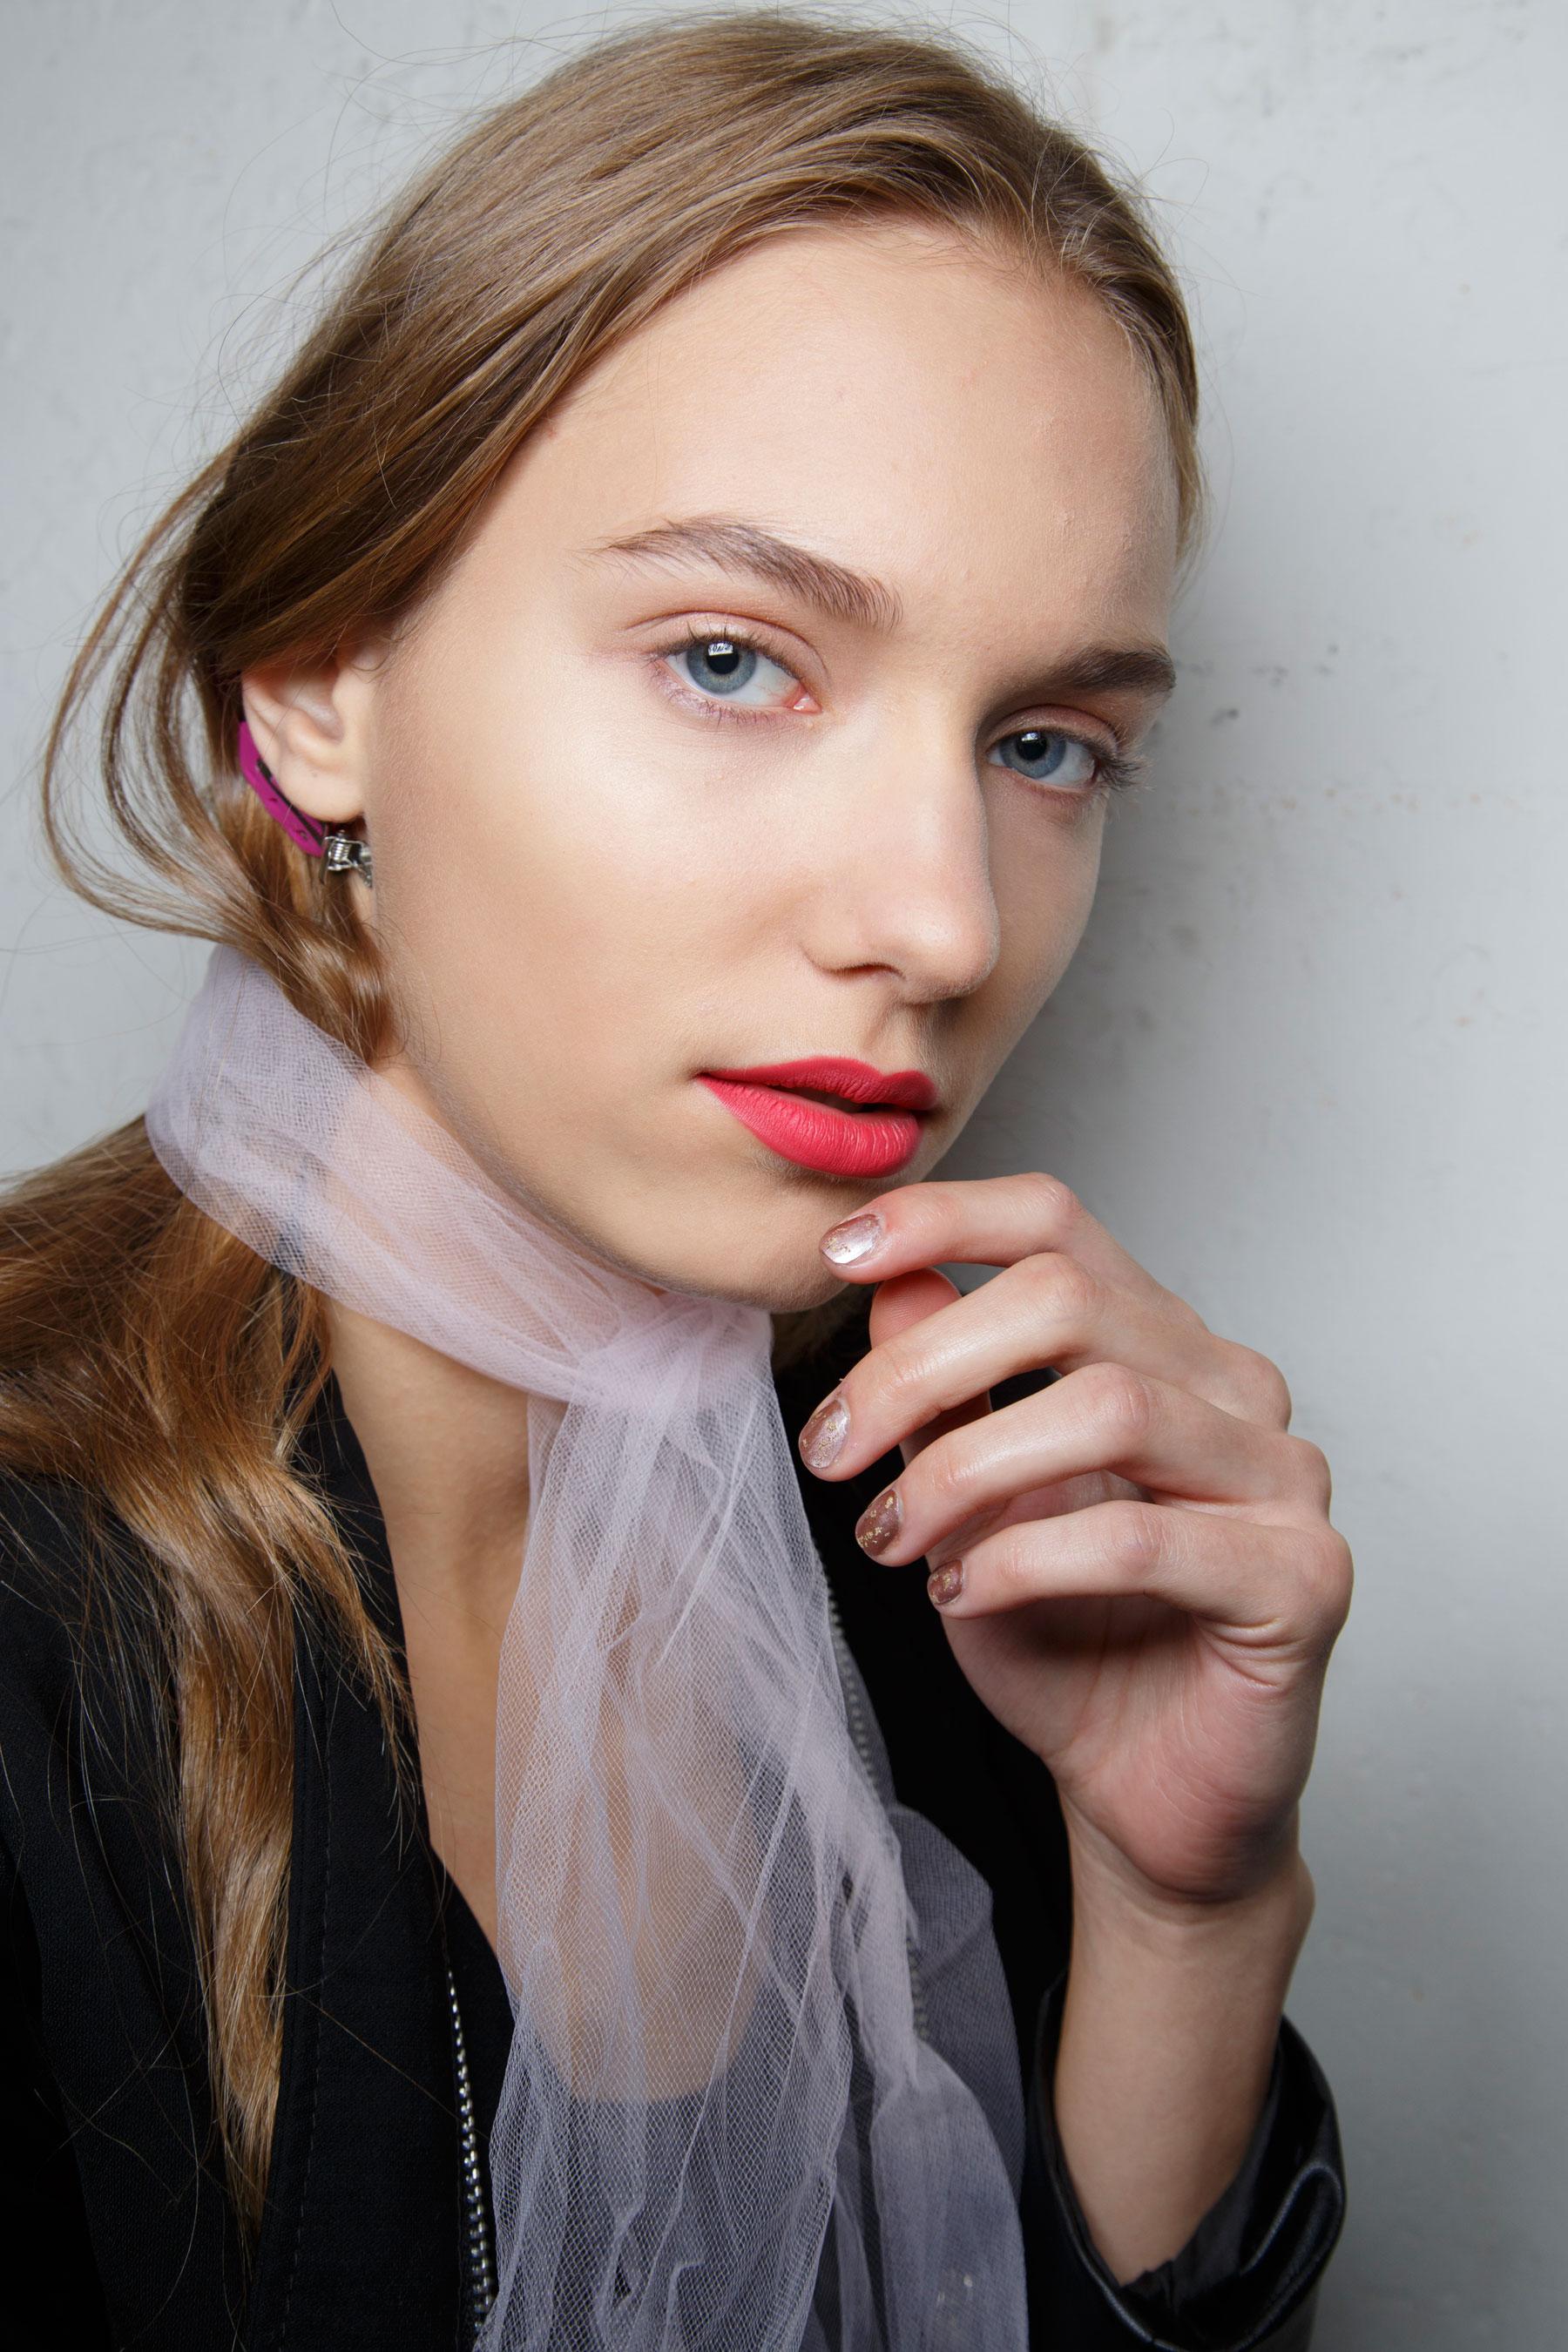 BADGLEY-MISCHKA-backstage-beauty-spring-2016-fashion-show-the-impression-37